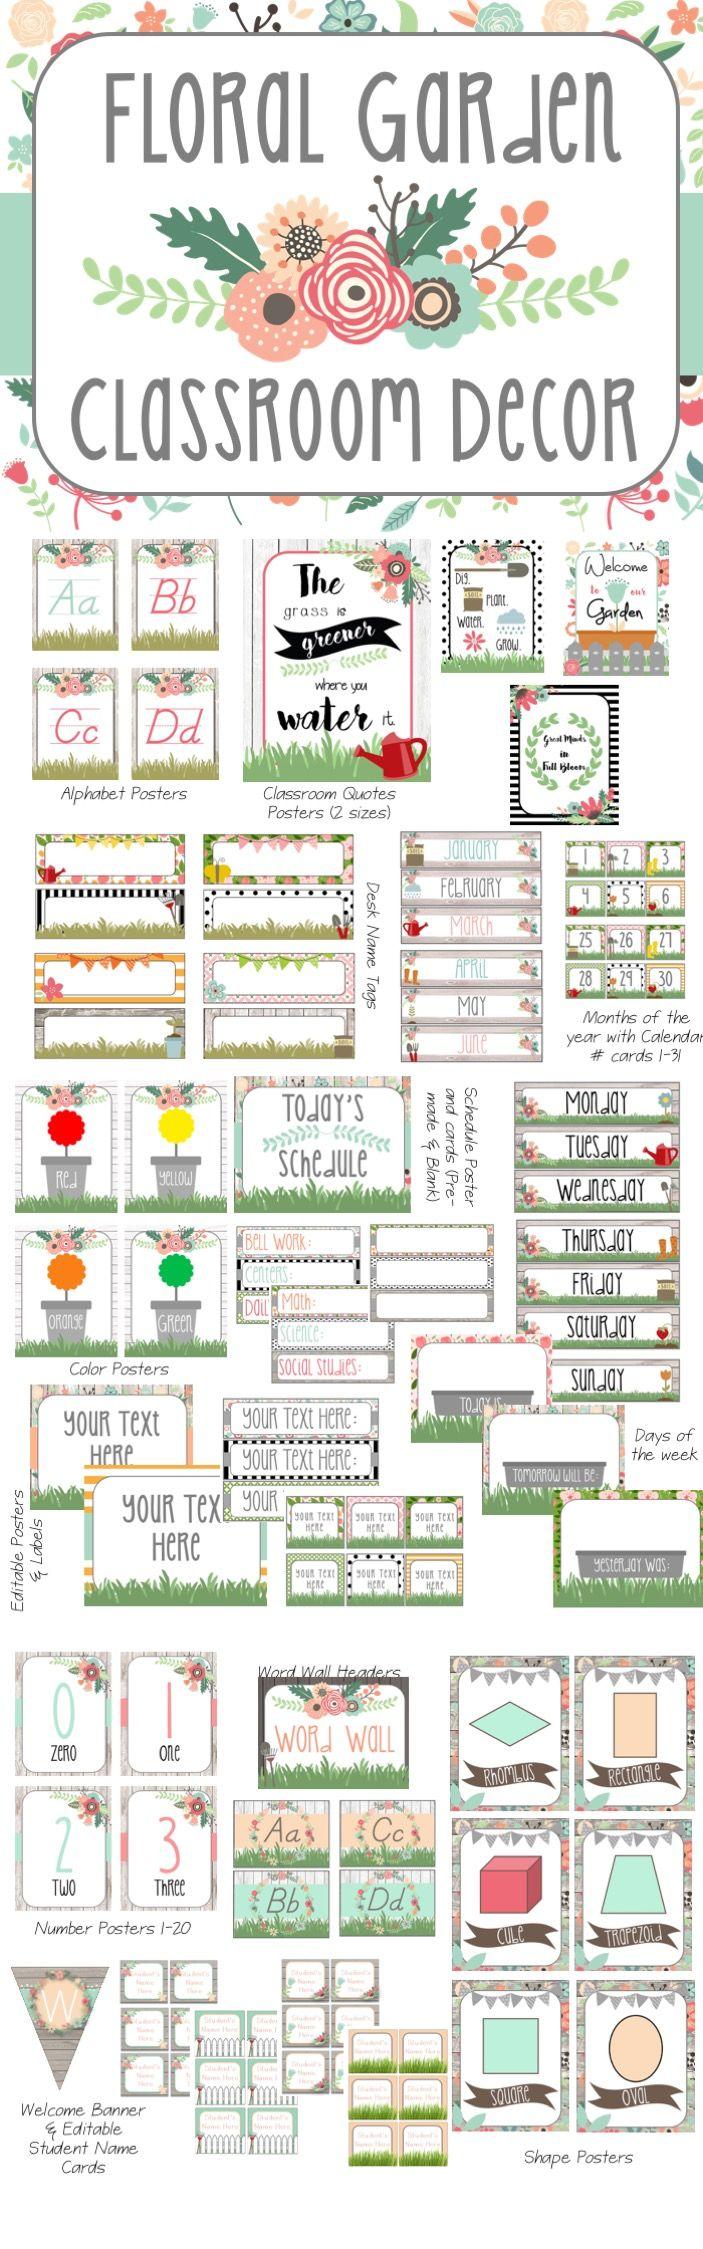 floral garden rustic themed decor pack - Classroom Design Ideas